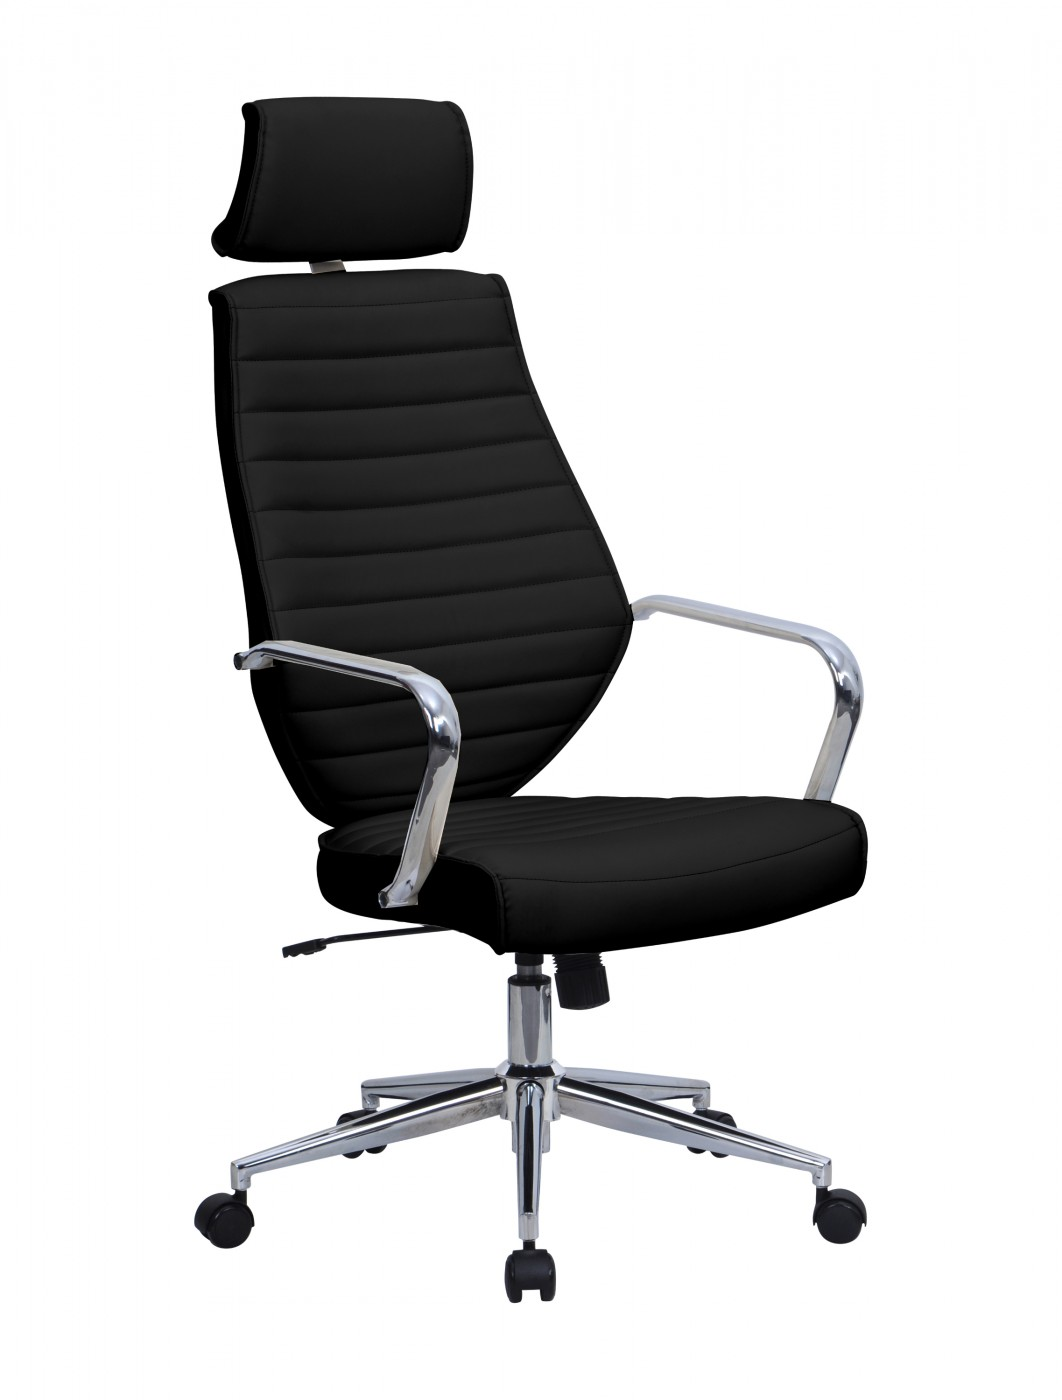 Eliza Tinsley Atlas Executive Chair BCP G448 121 Office Furniture